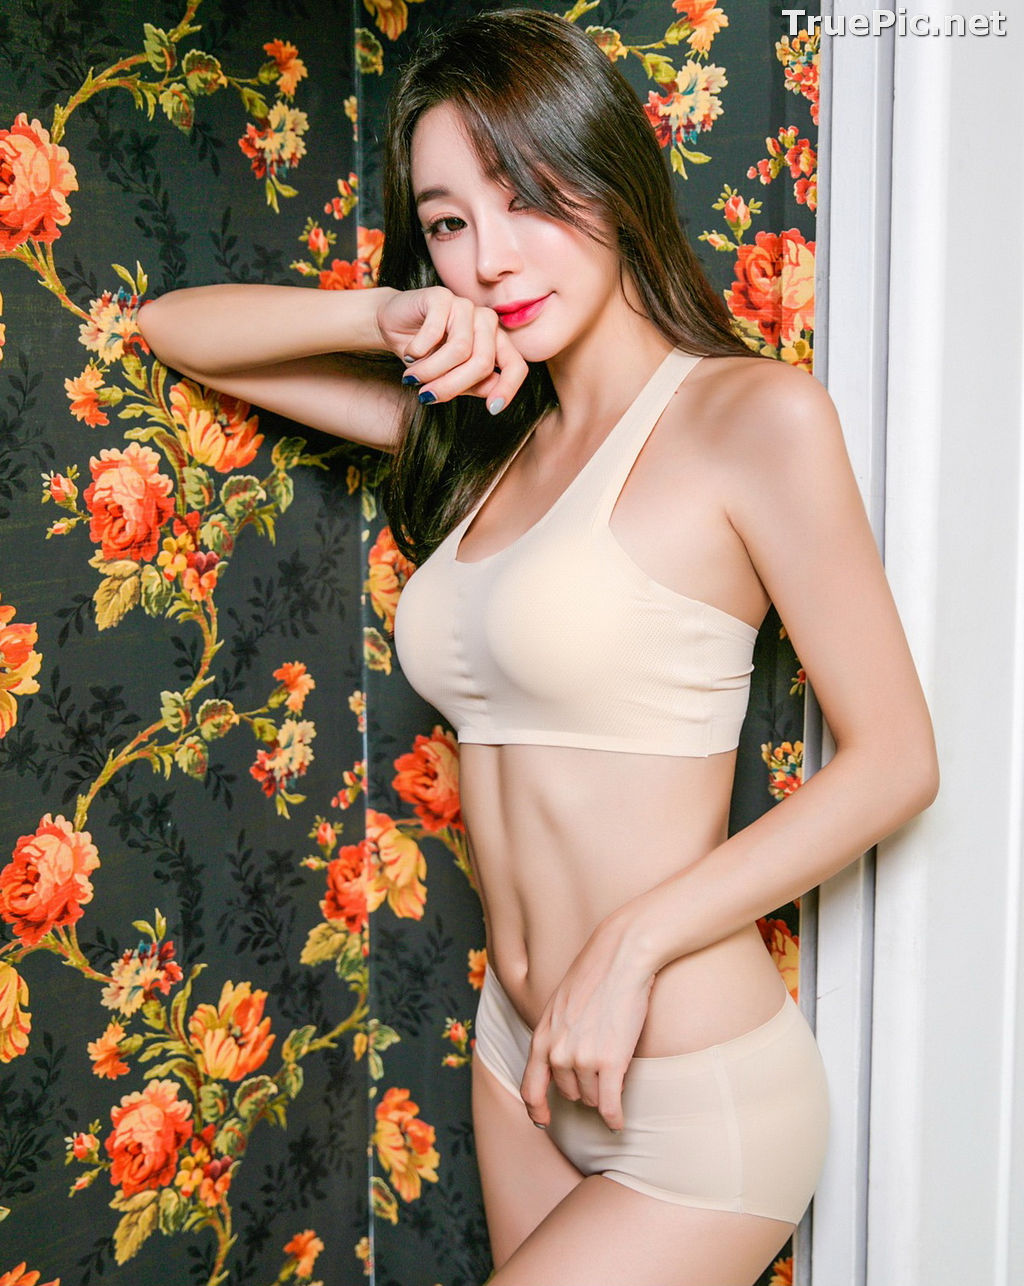 Image Hyun Kyung - Korean Fashion Model - Nude Color Undies - TruePic.net - Picture-5